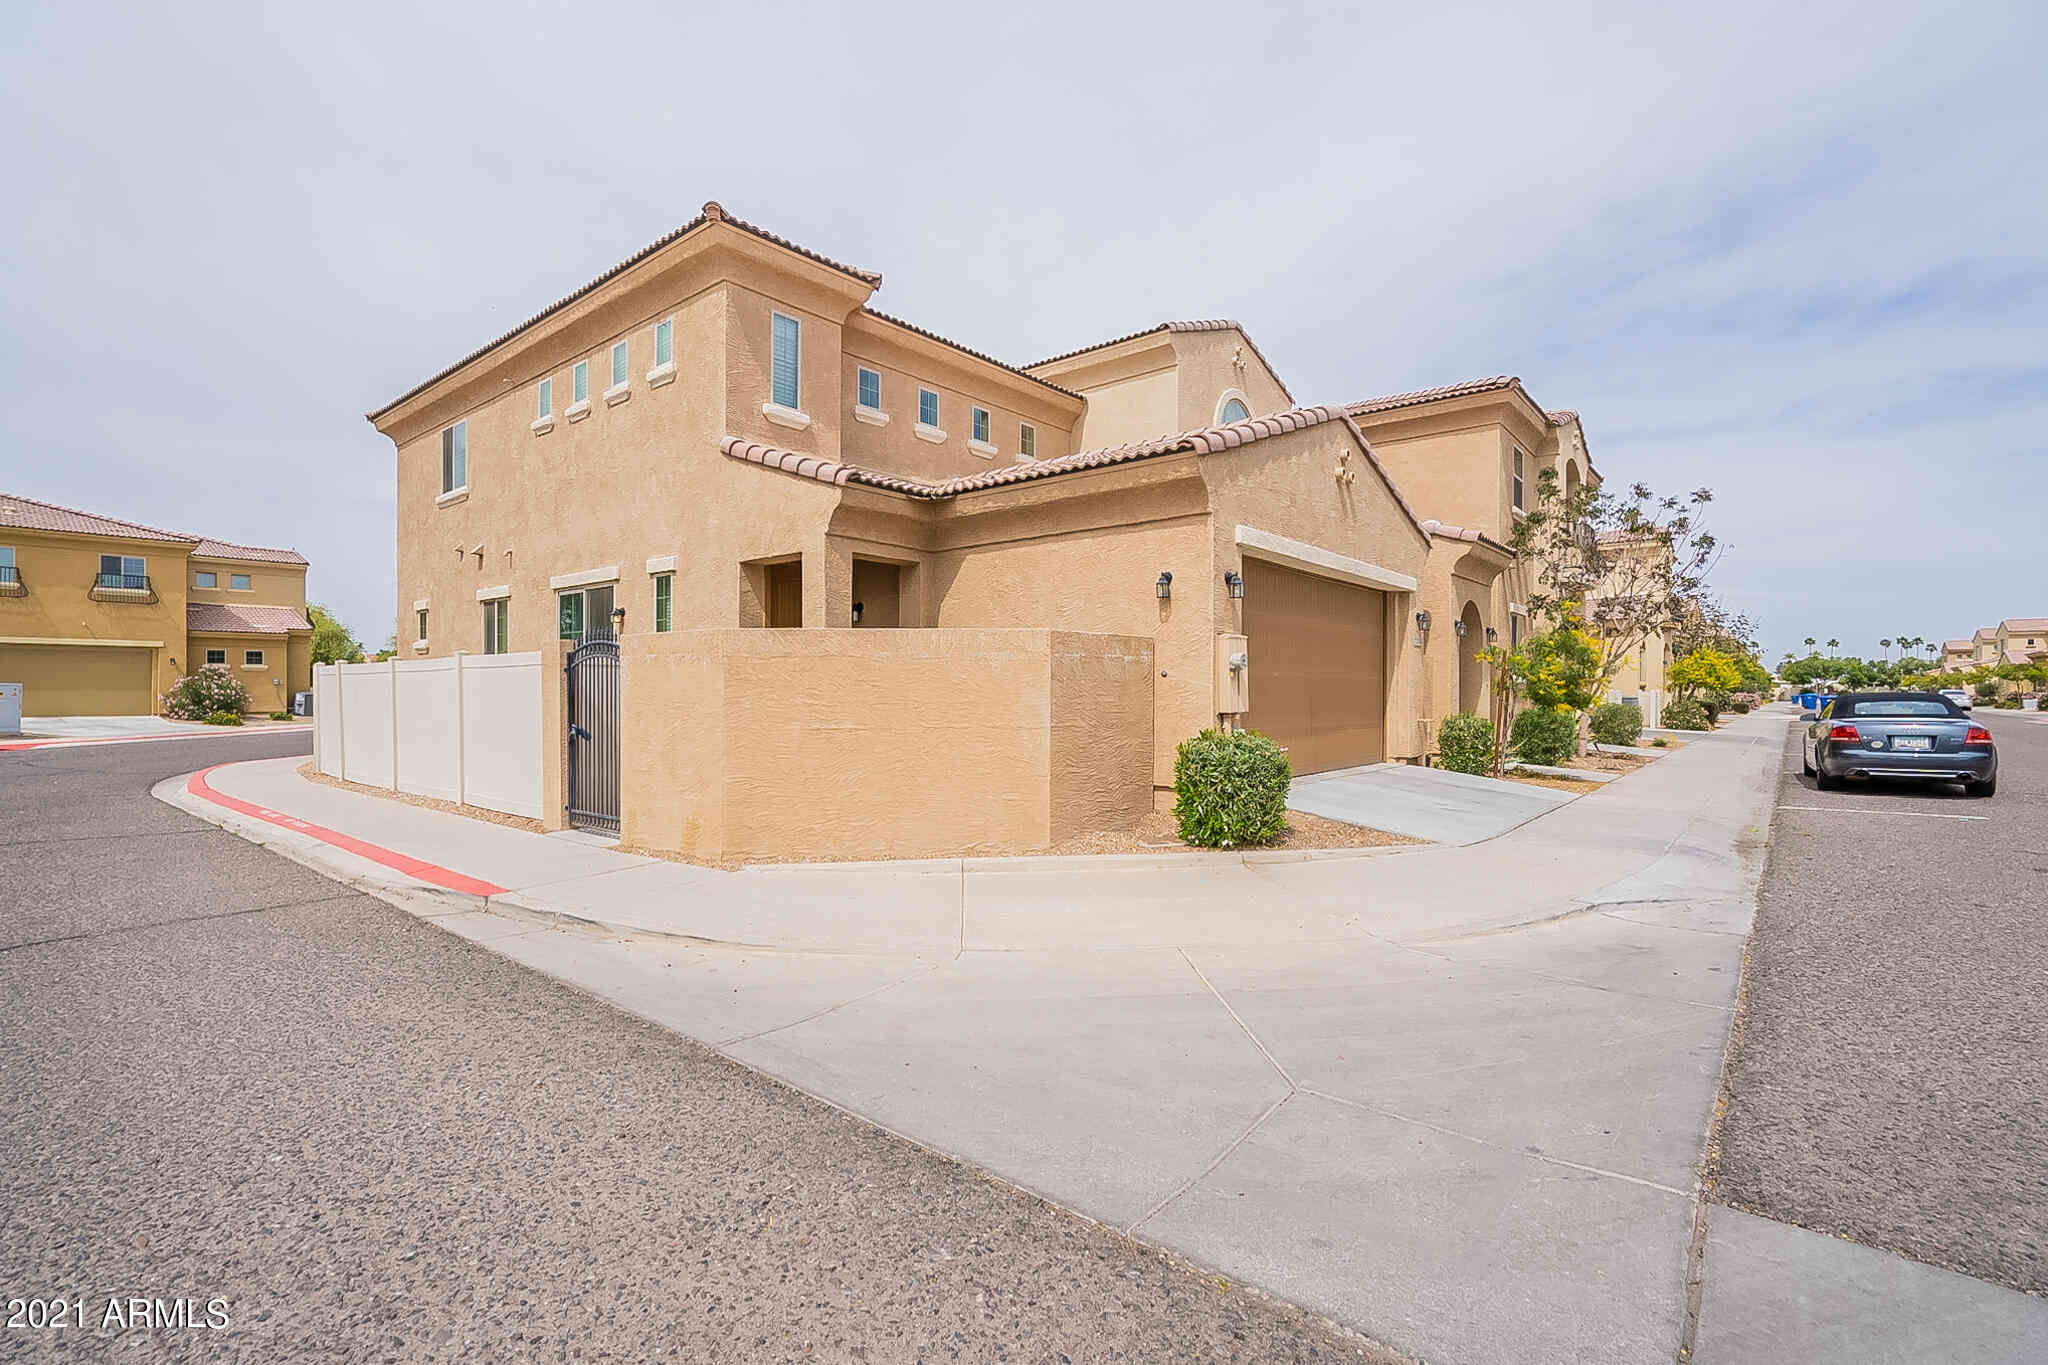 1367 S Country Club Dr -- #1141, Mesa, AZ, 85210,